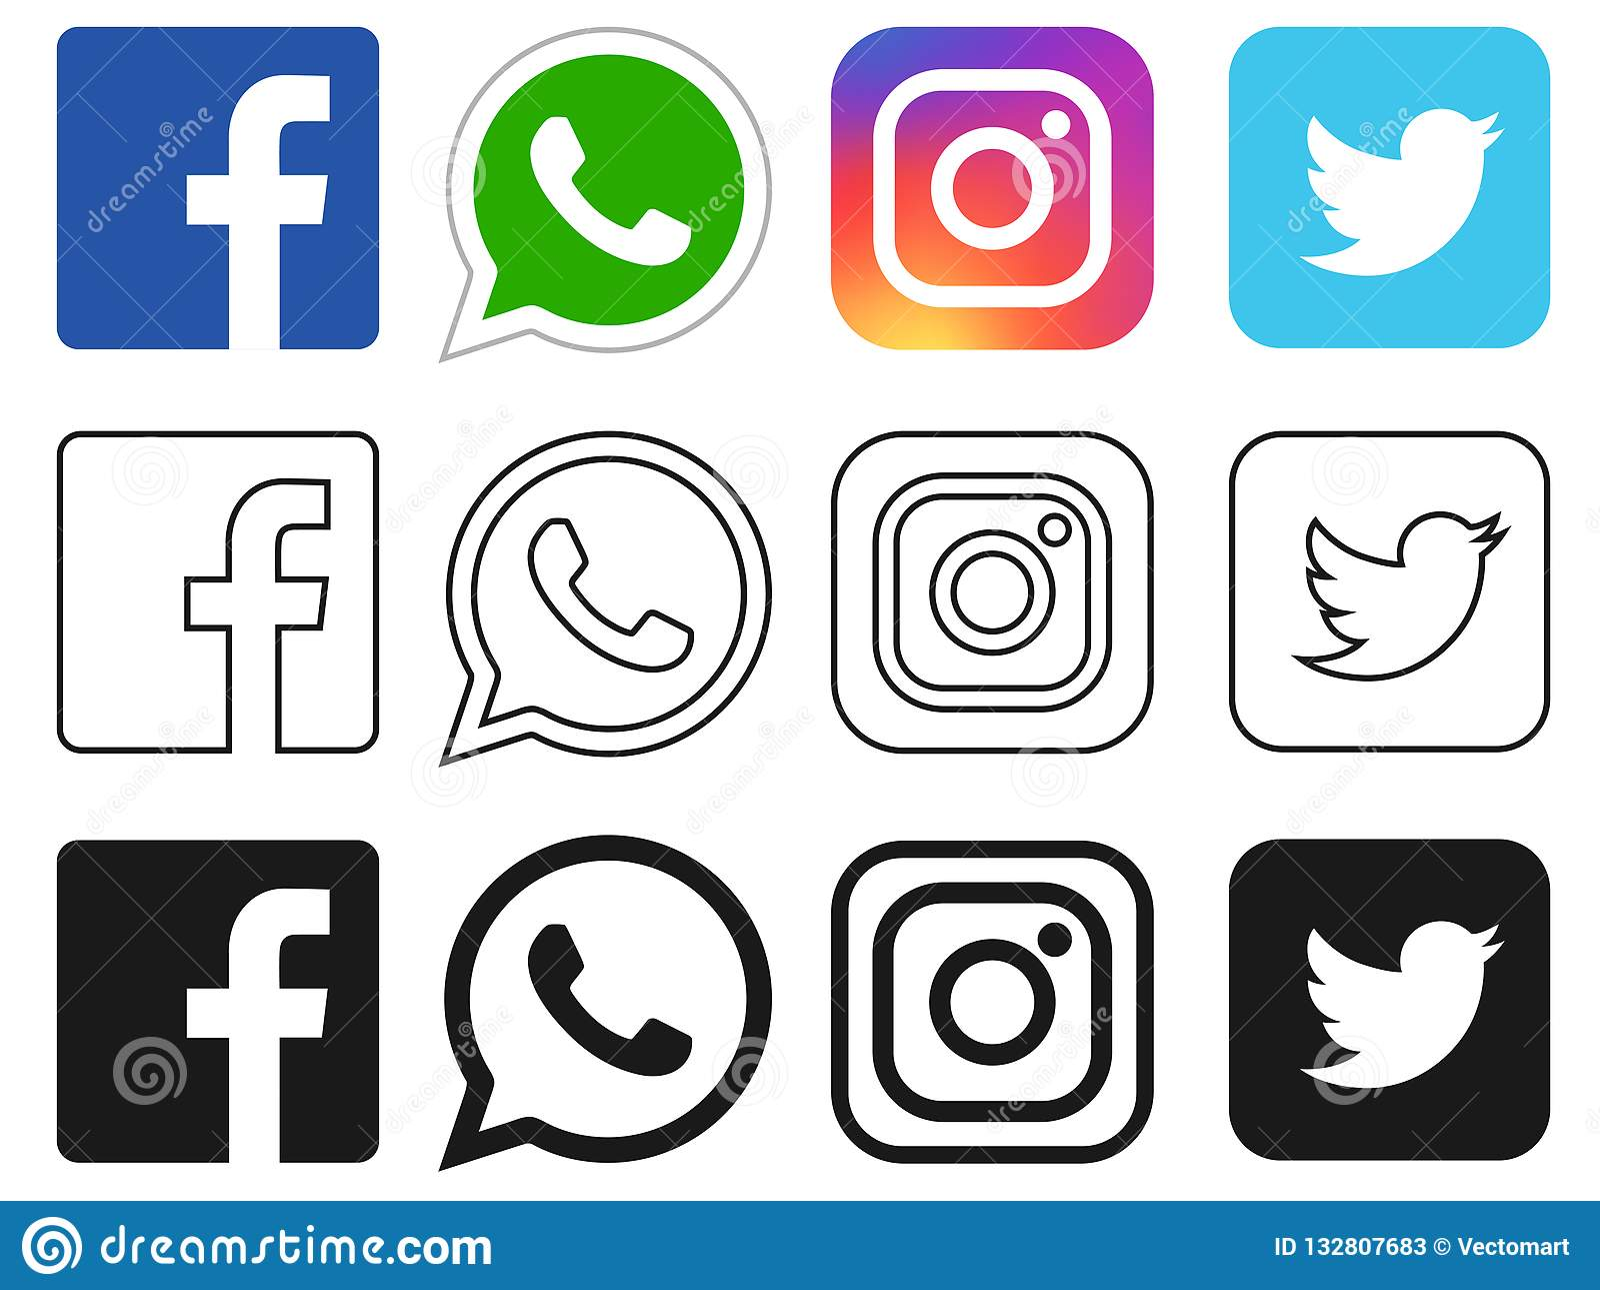 Social media icon for Facebook, Whatsapp, Instagram, Twitter